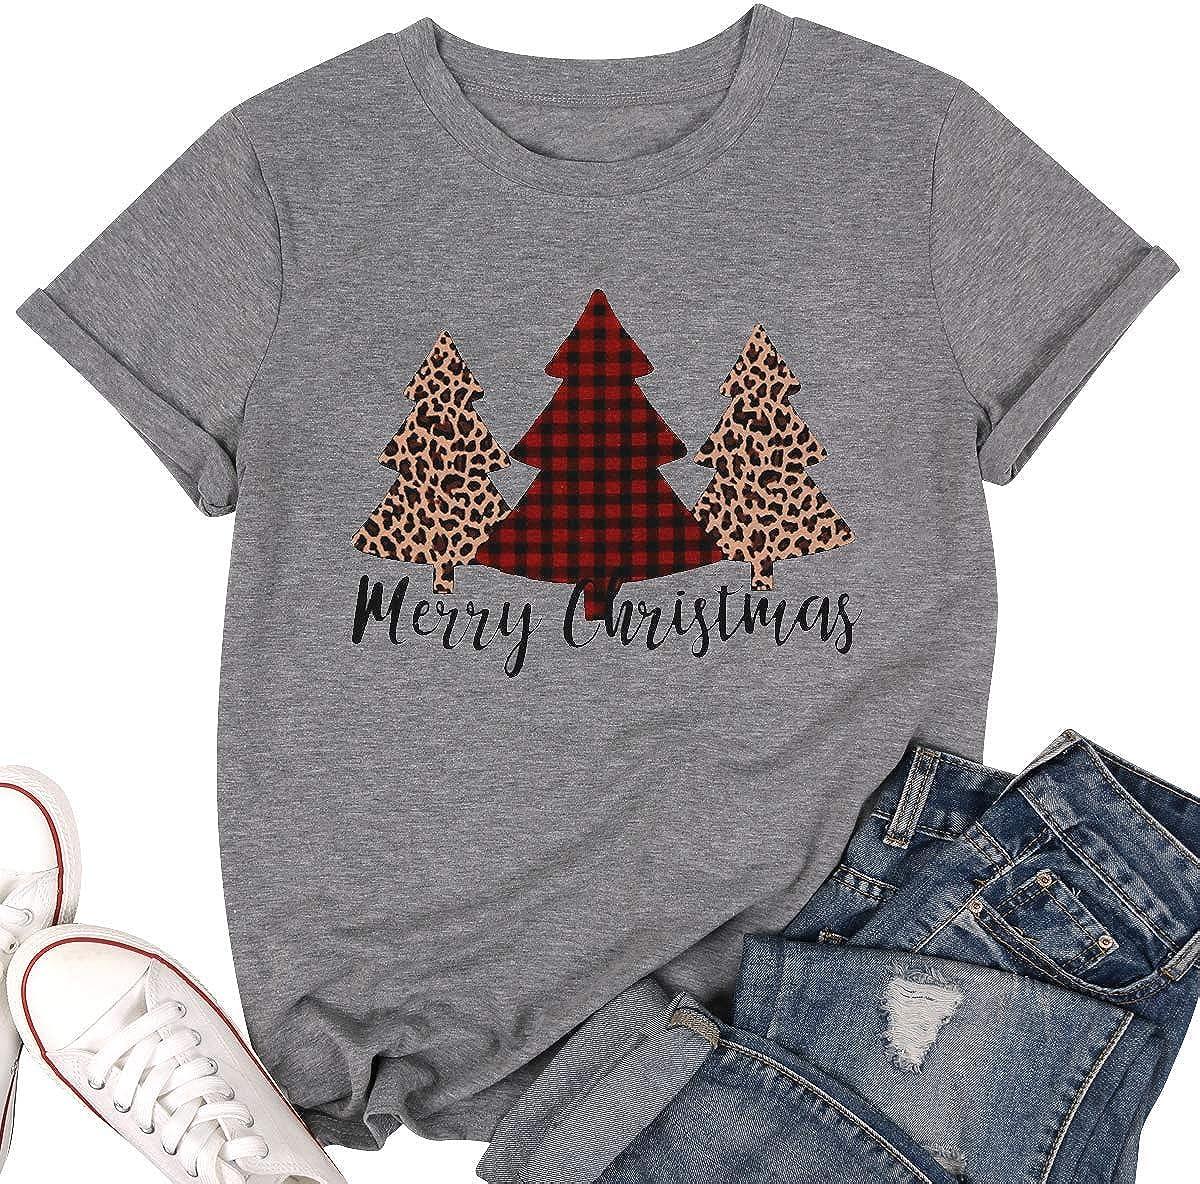 Merry Christmas Tree Print T-Shirt Women Leopard Plaid Casual Short Sleeve Tee Tops Blouse